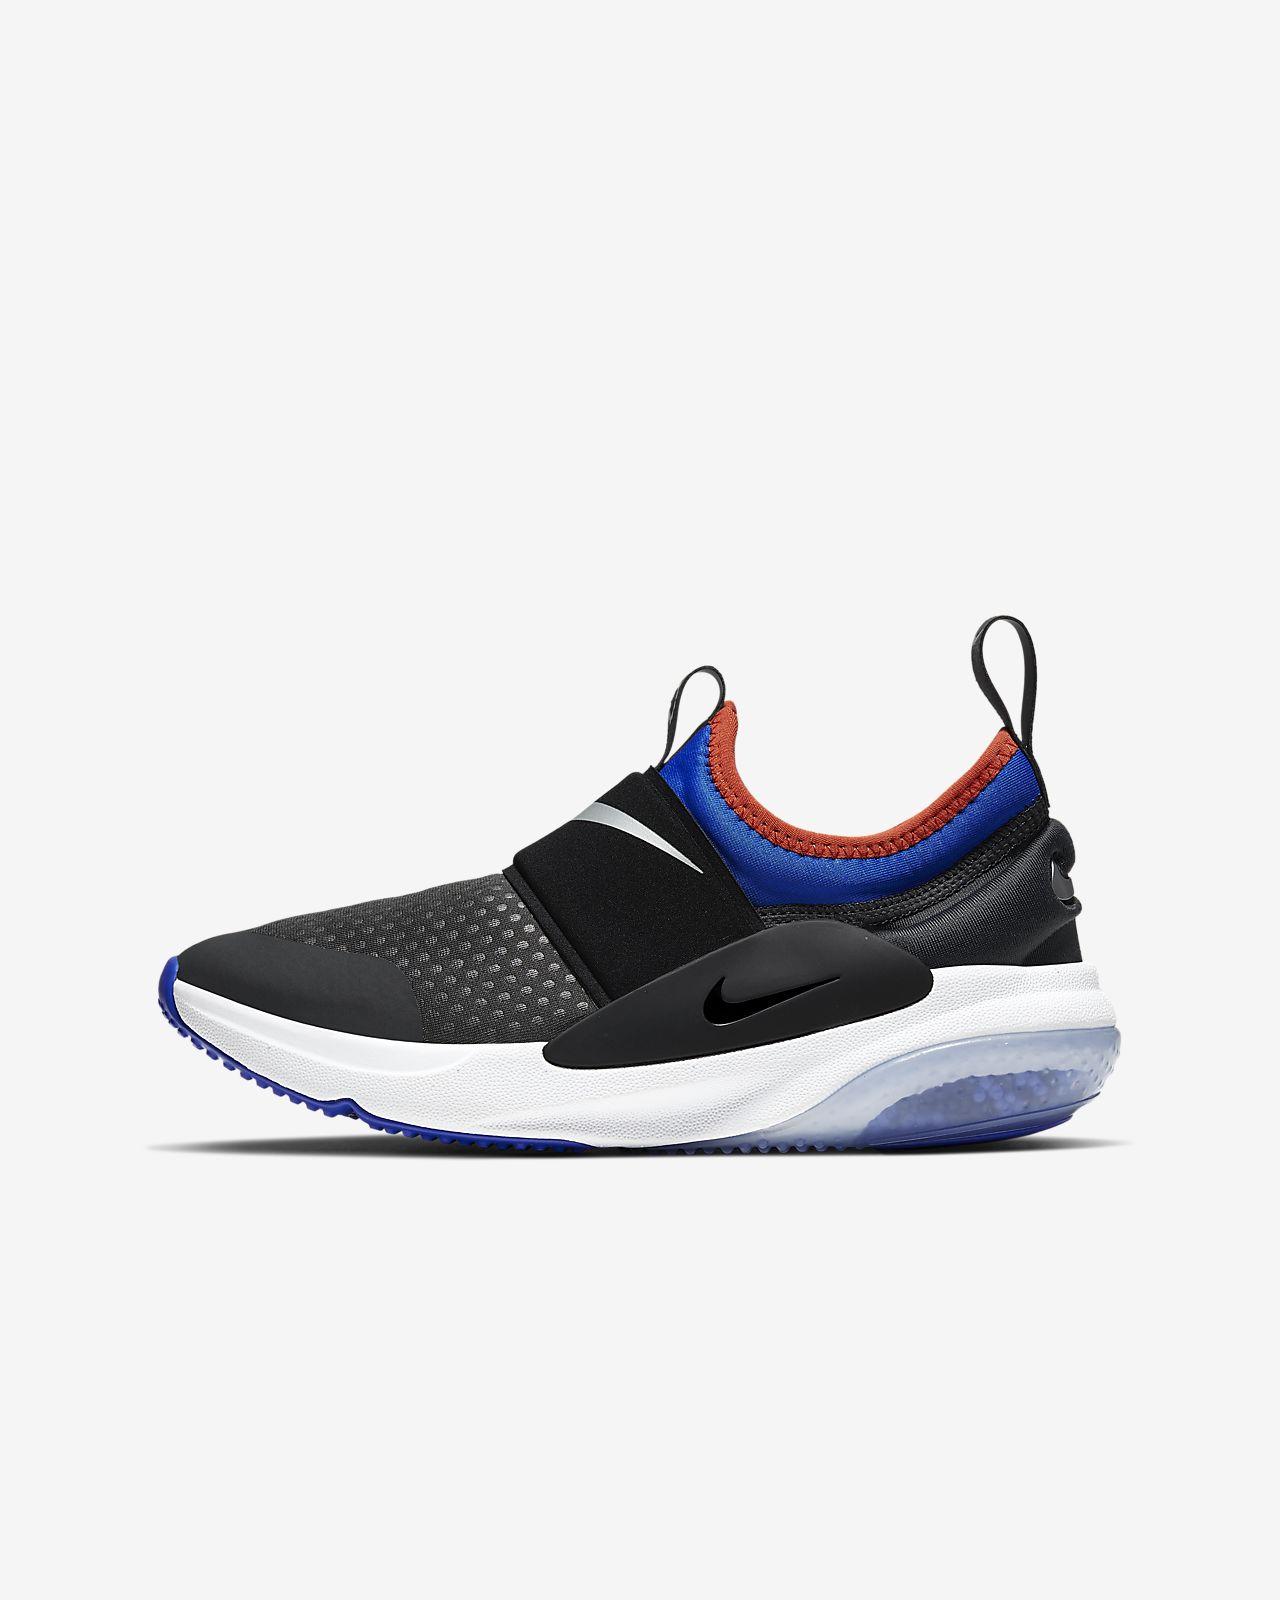 Nike JoyrideNova (GS)大童运动童鞋